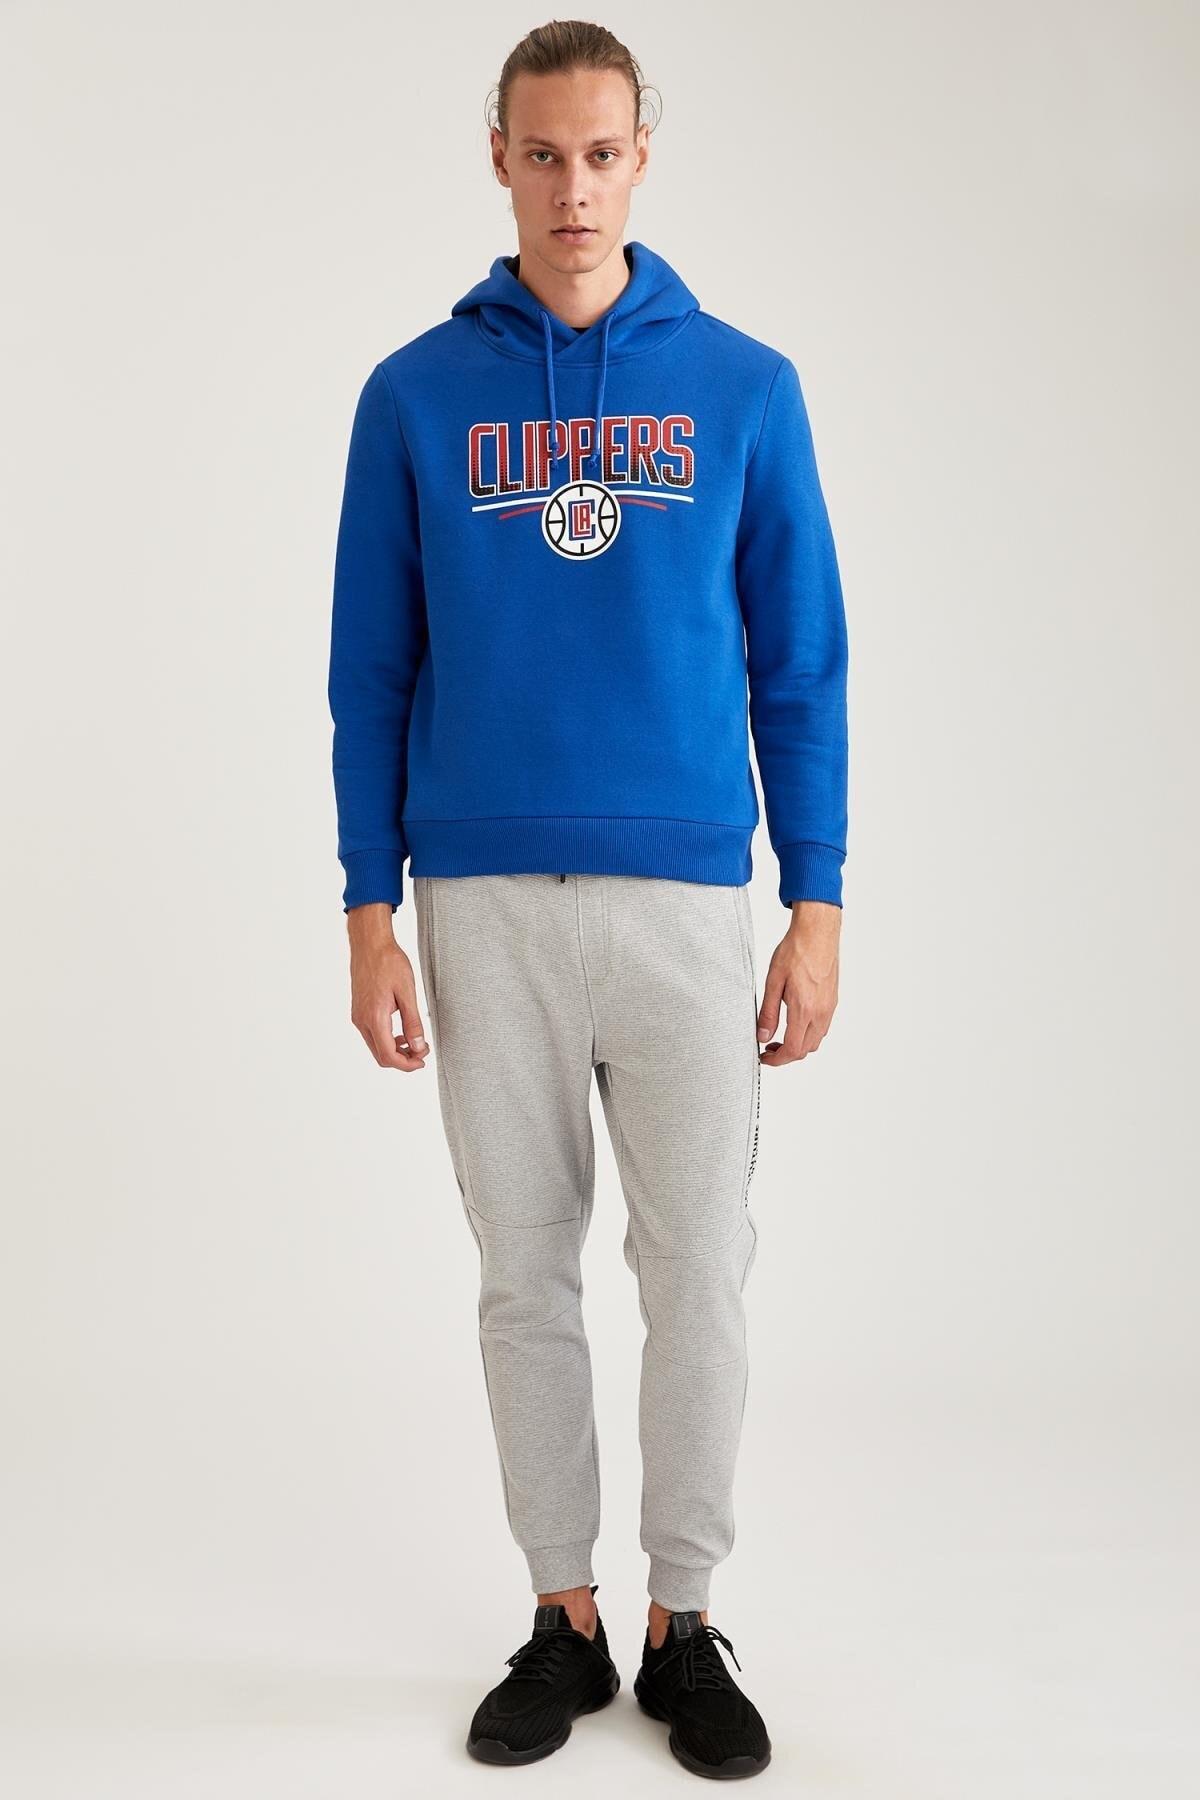 Defacto Fit Erkek Nba Lisanslı Unisex Kapüşonlu Slim Fit Sweatshirt 1